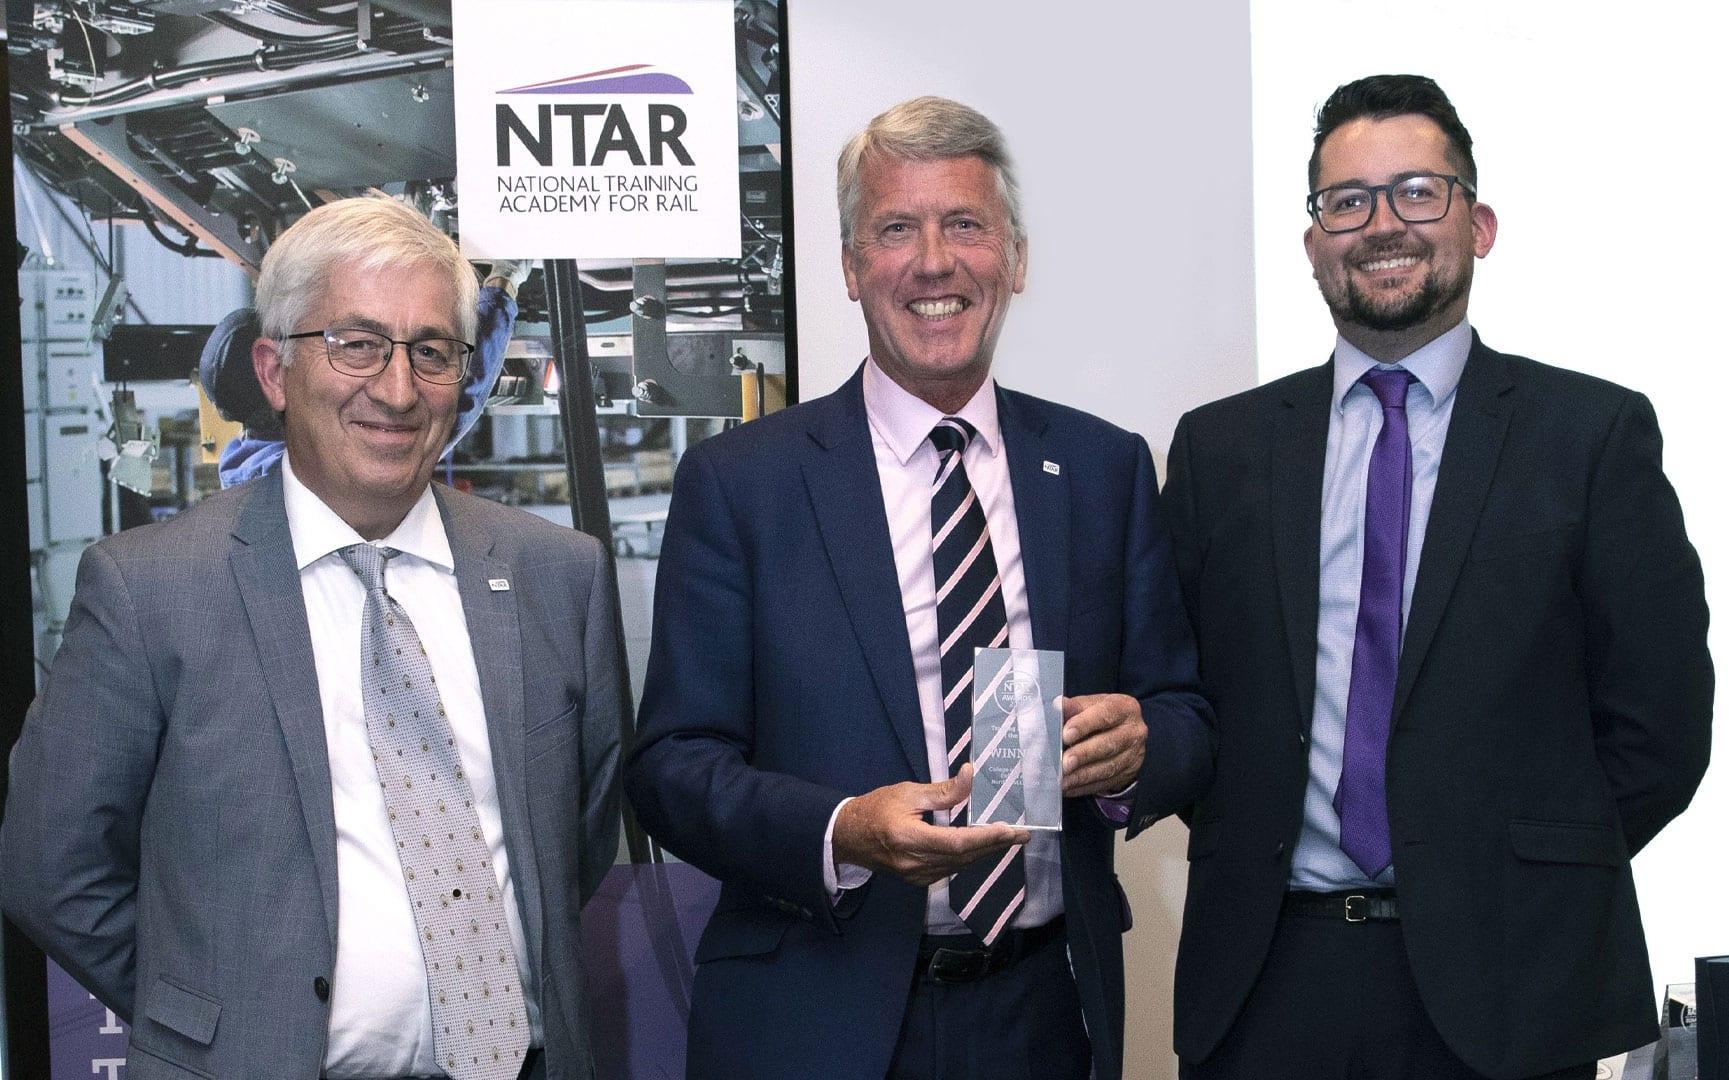 NTAR Awards